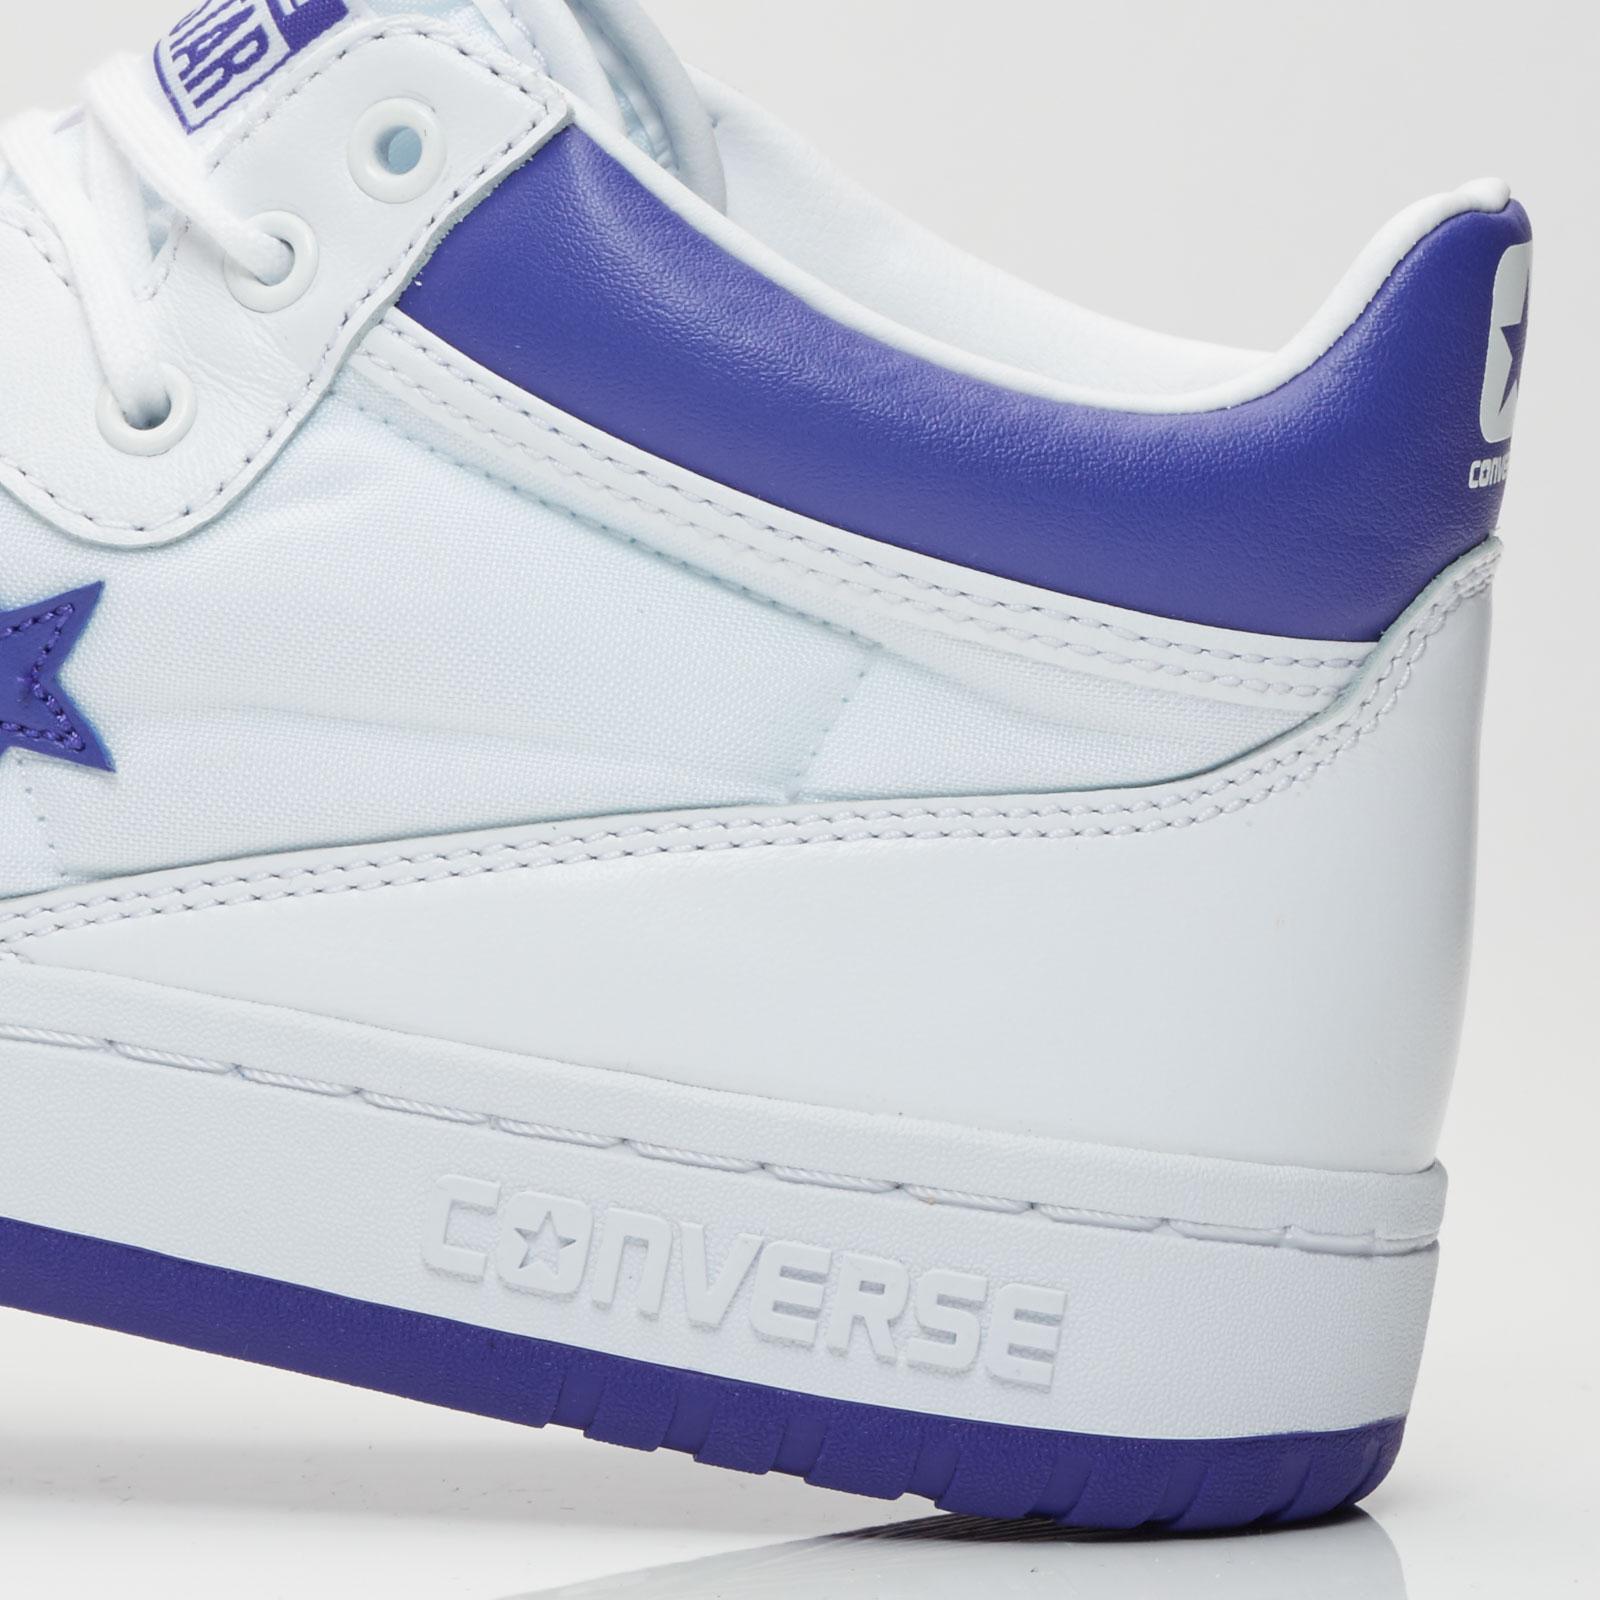 98c958eabb7752 Converse Fastbreak 83 Mid - 156972c - Sneakersnstuff